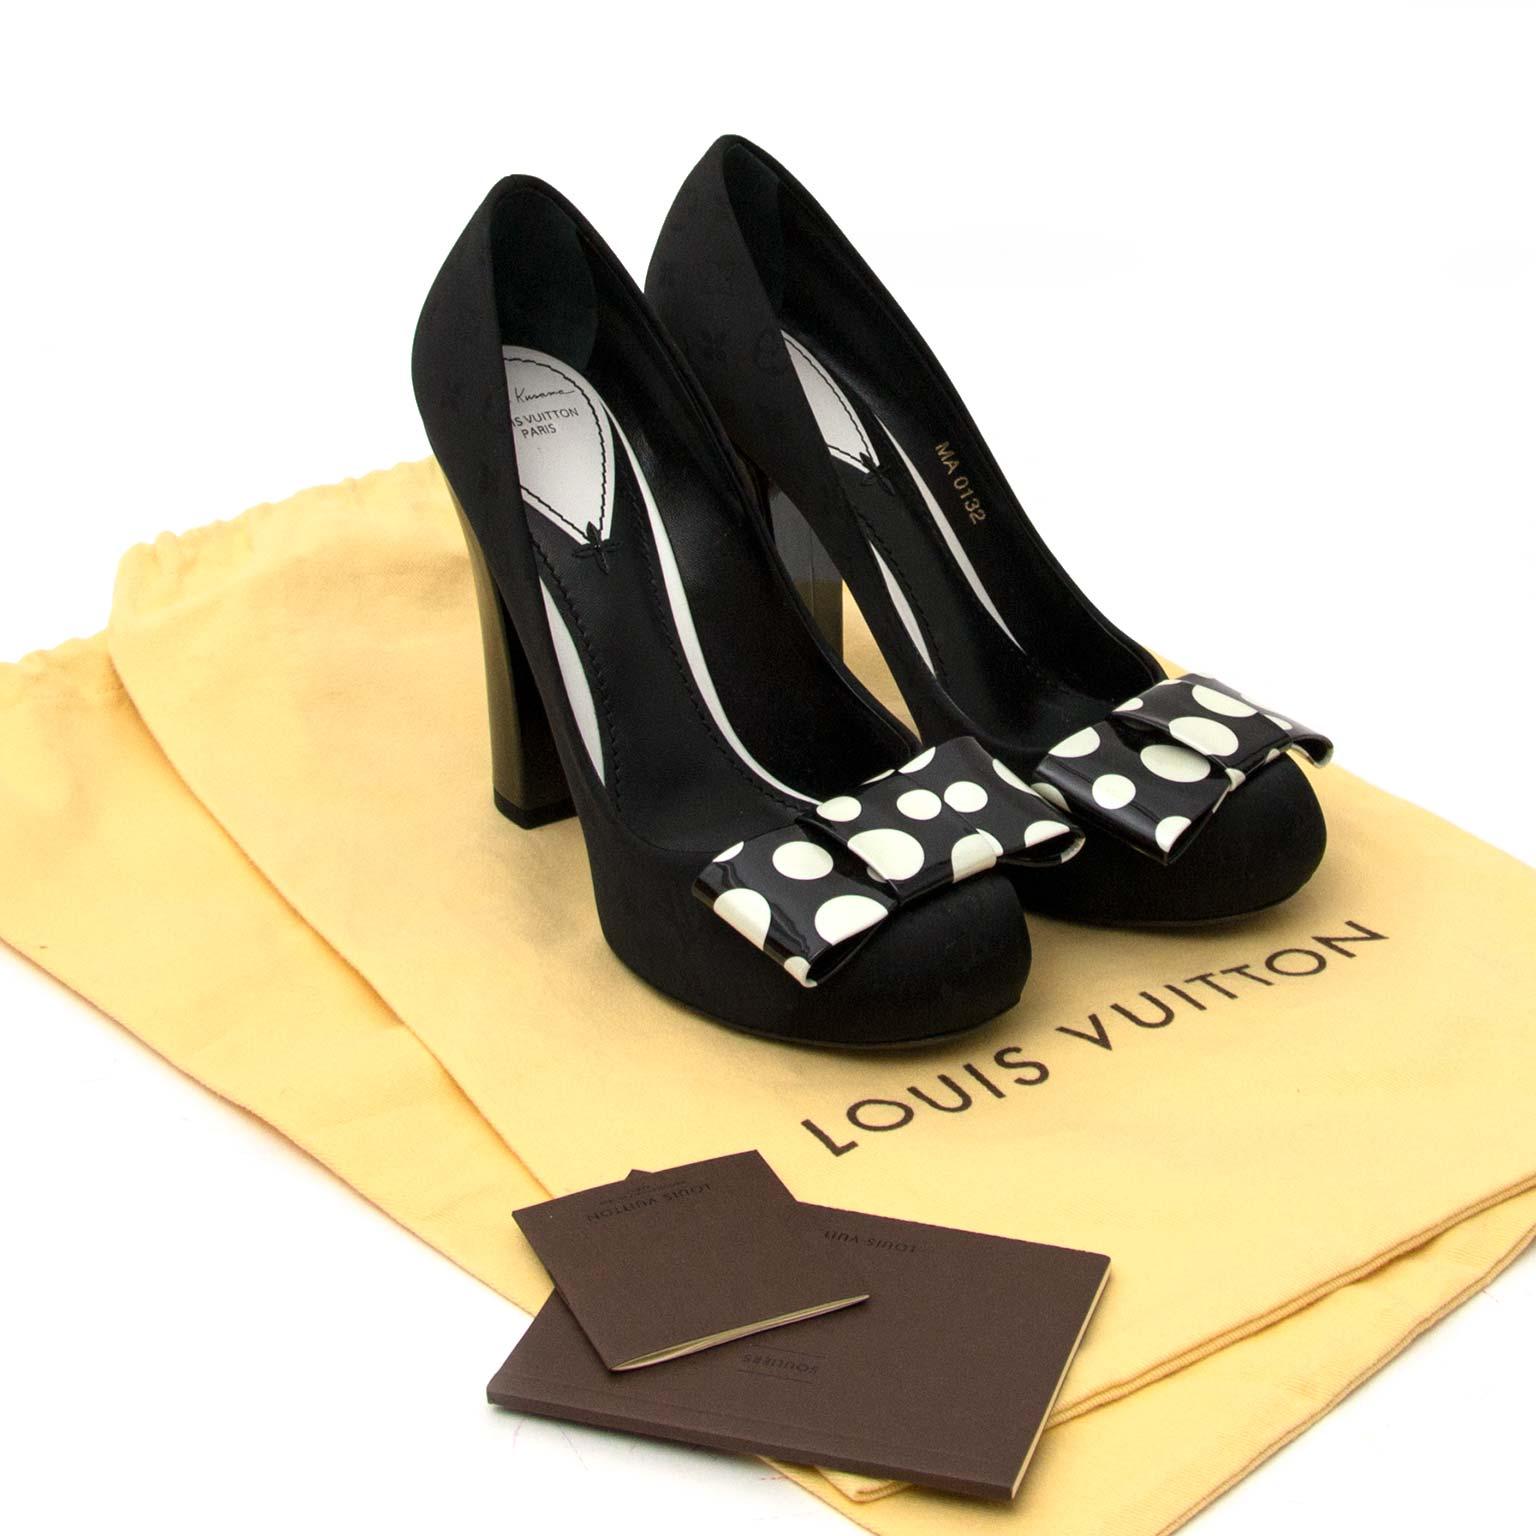 Louis Vuitton x Yayoi Kusama Polka Dot Pumps for sale online at Labellov